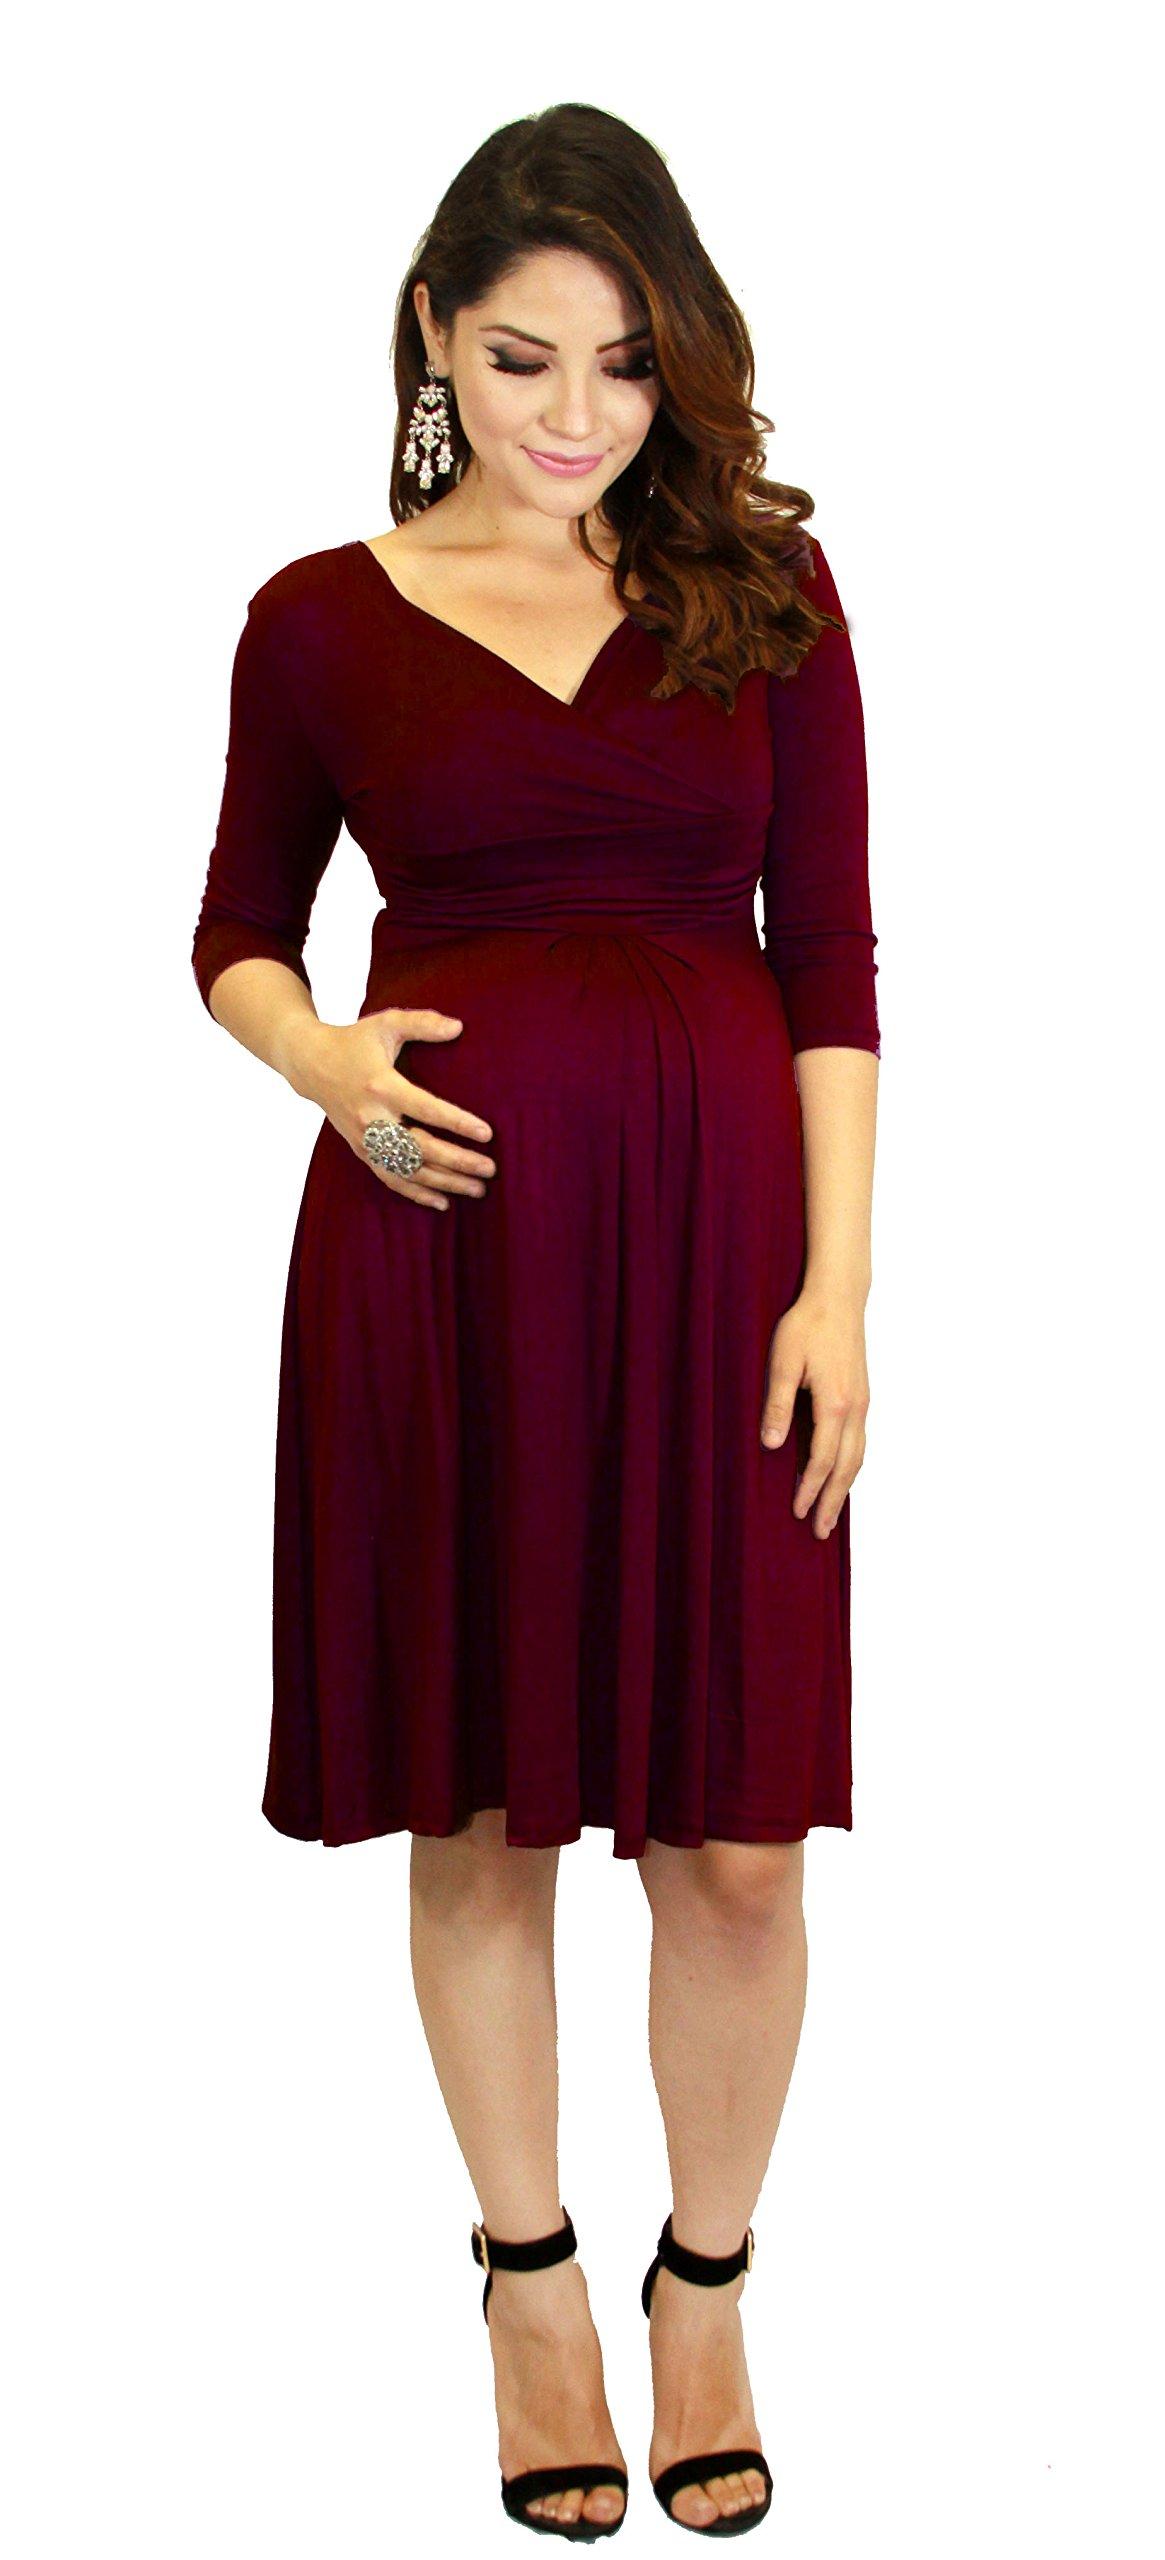 Long Sleeve Maternity Dress Knee Lenght Wedding BabyShower (l, burgundy)